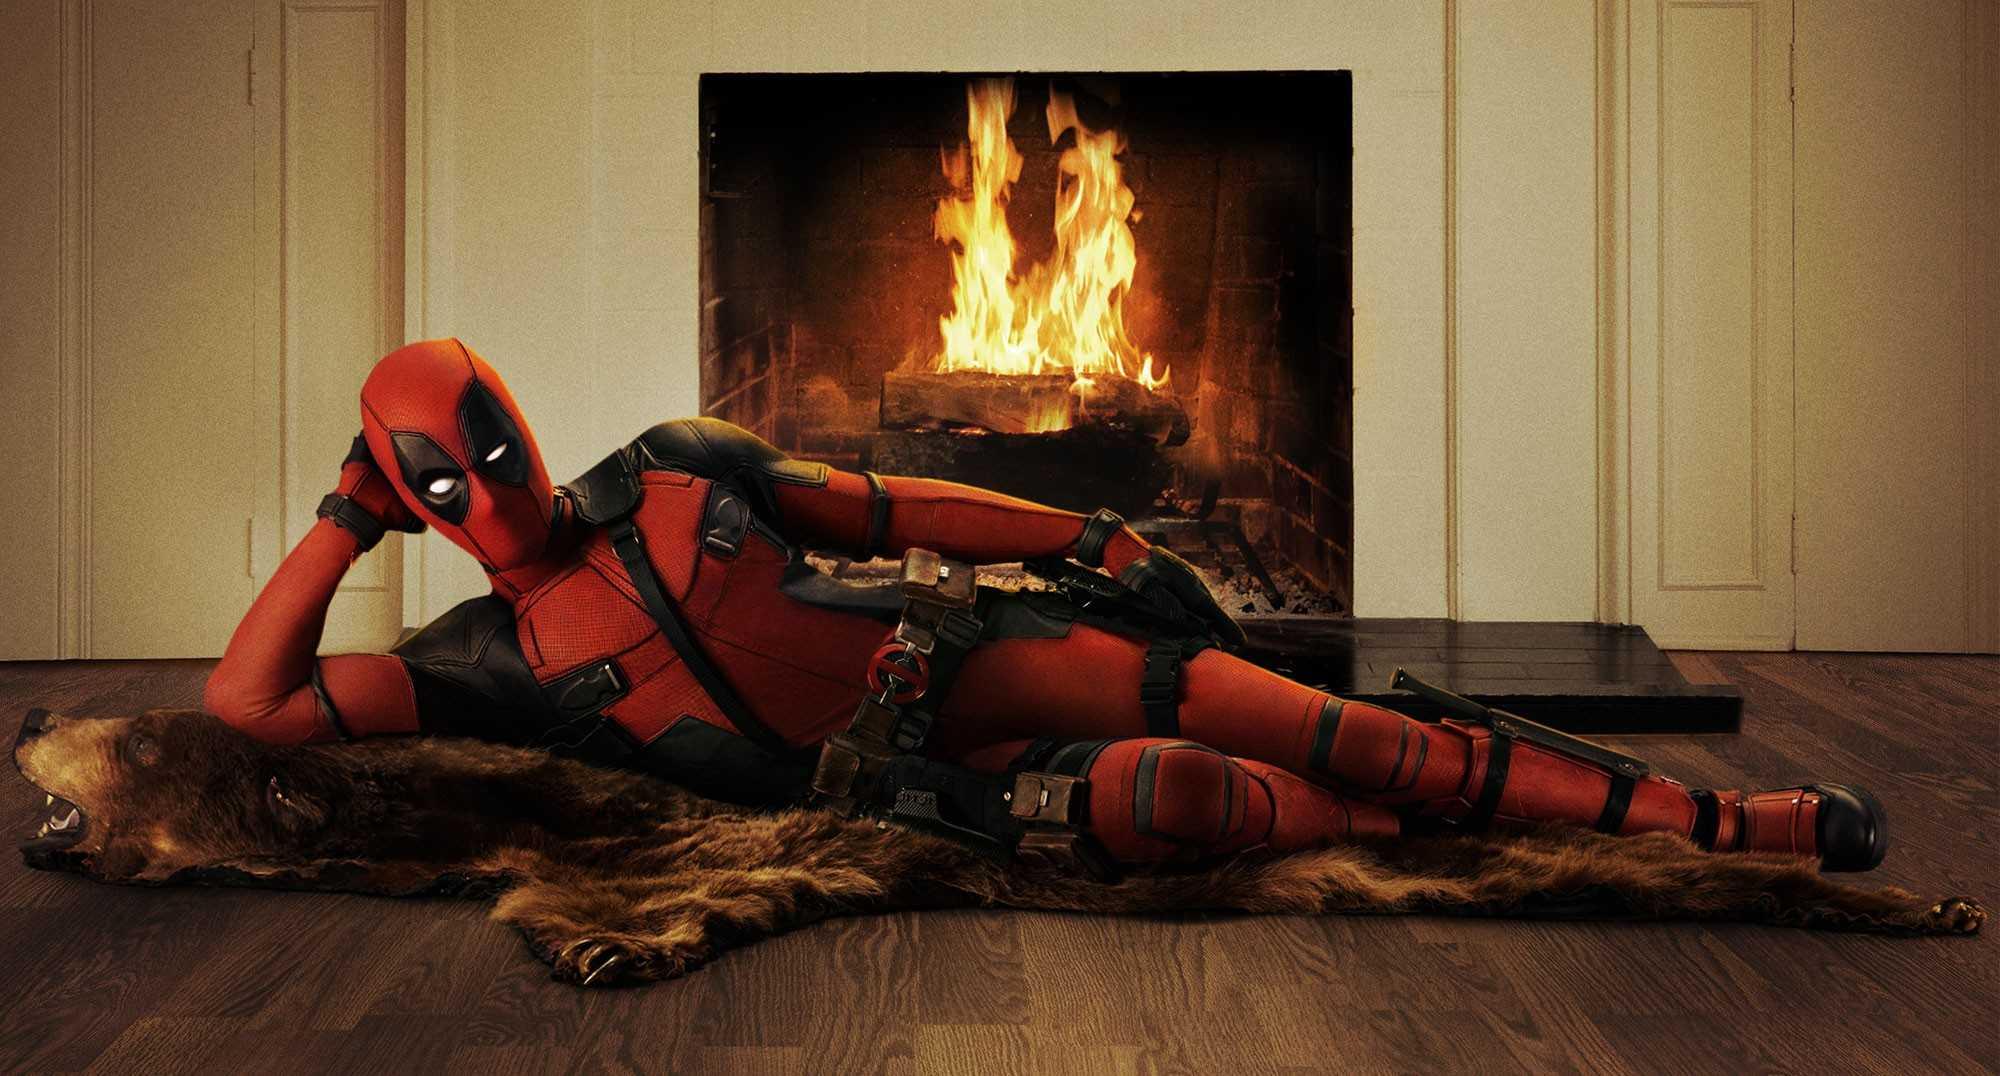 'Deadpool': not your average superhero